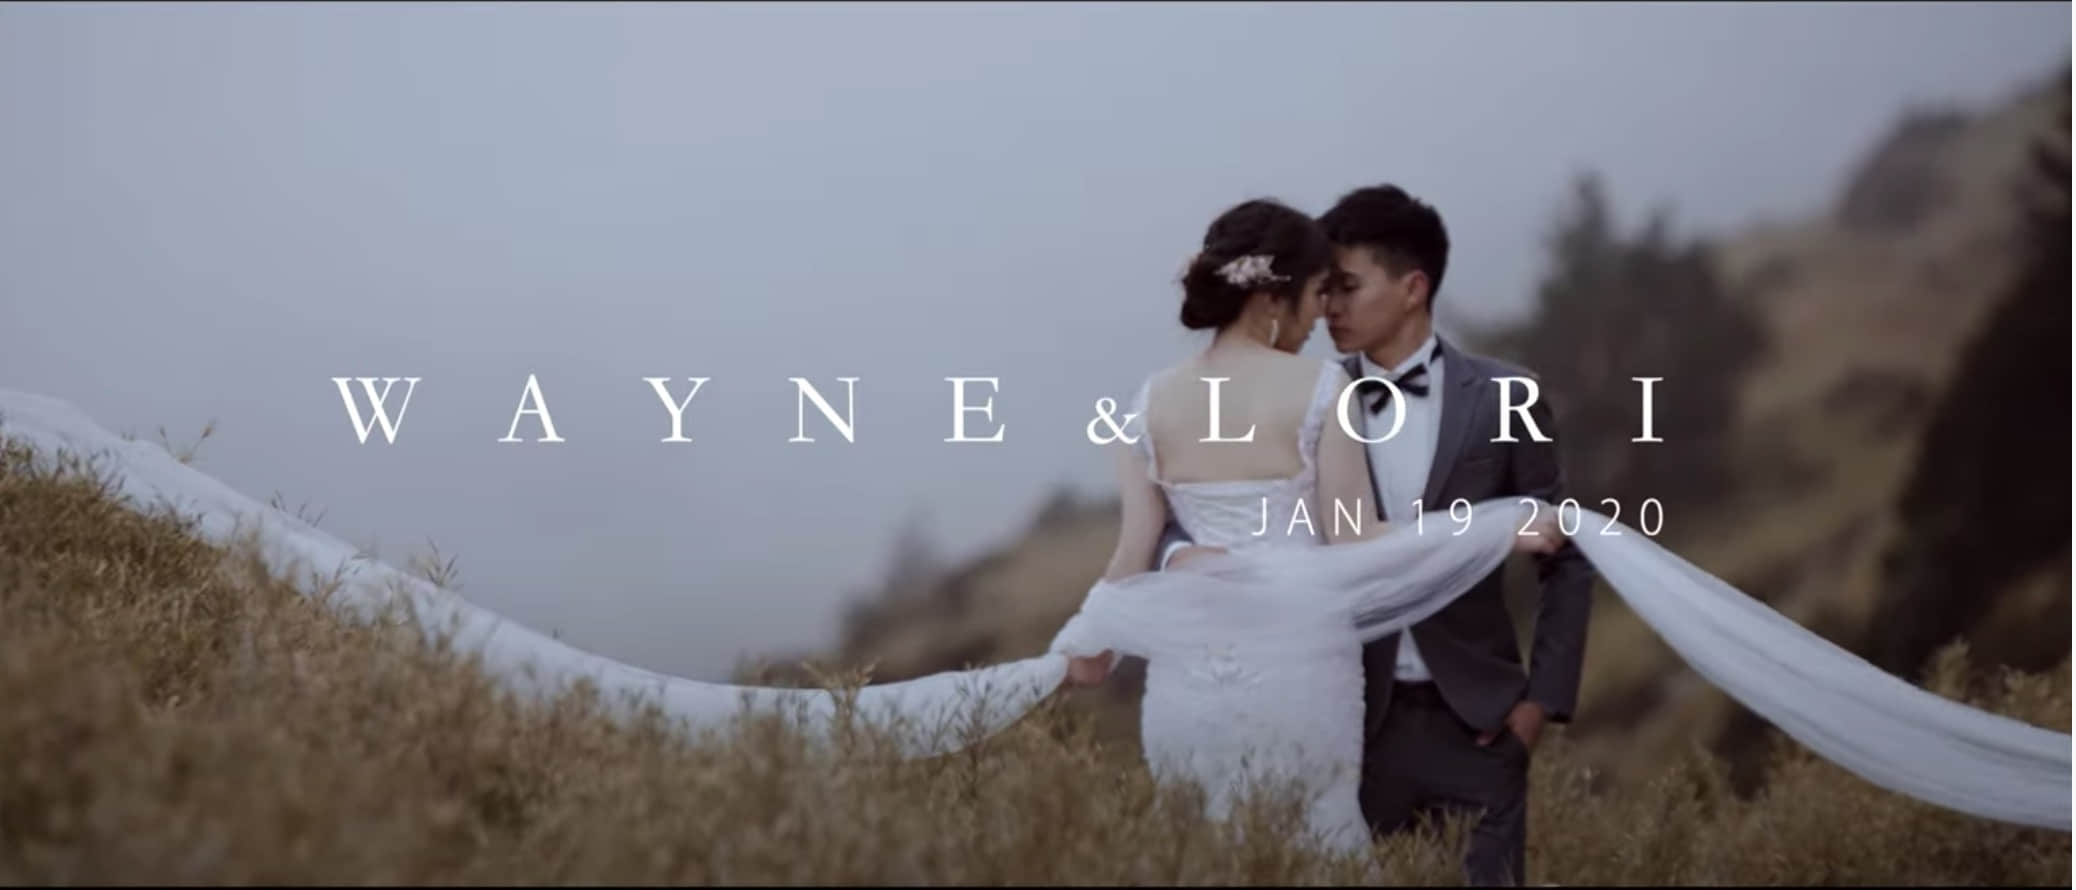 Wayne&Lori pre-wedding MV